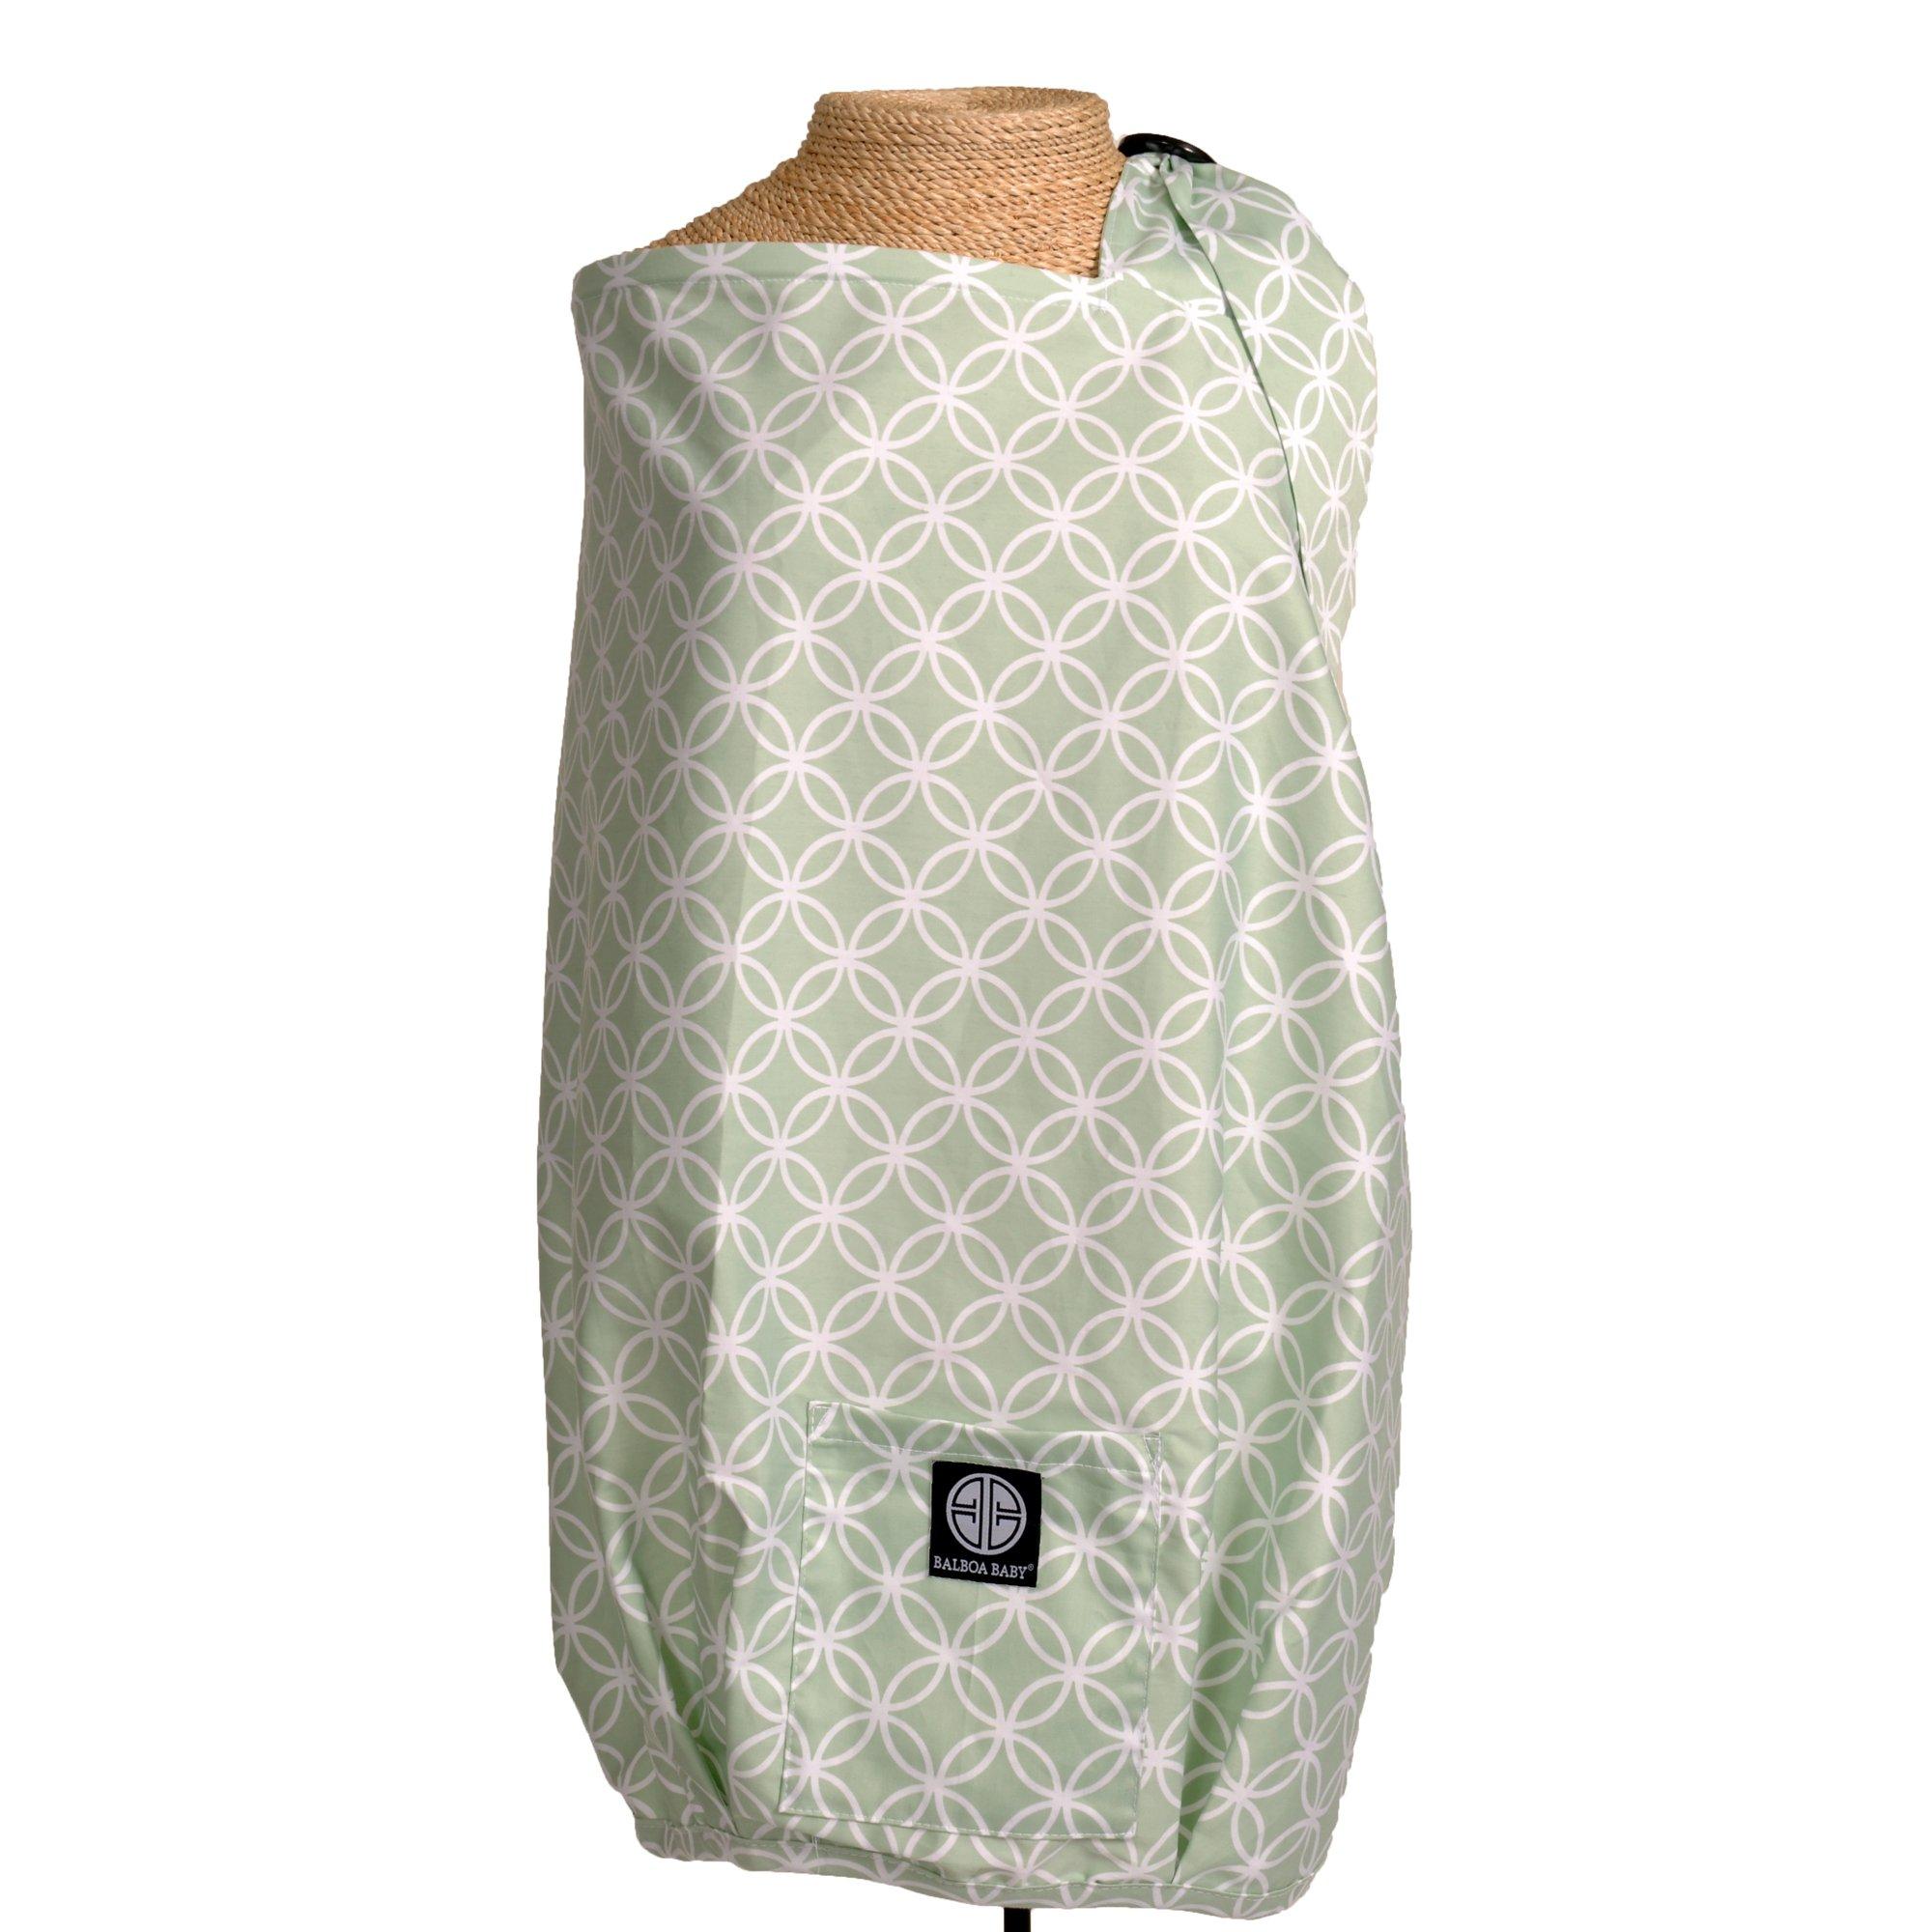 Balboa Baby Nursing Cover Sage Circle  sc 1 st  Amazon.com & Amazon.com: Balboa Baby Car Seat Canopy Diamond/Bali: Baby